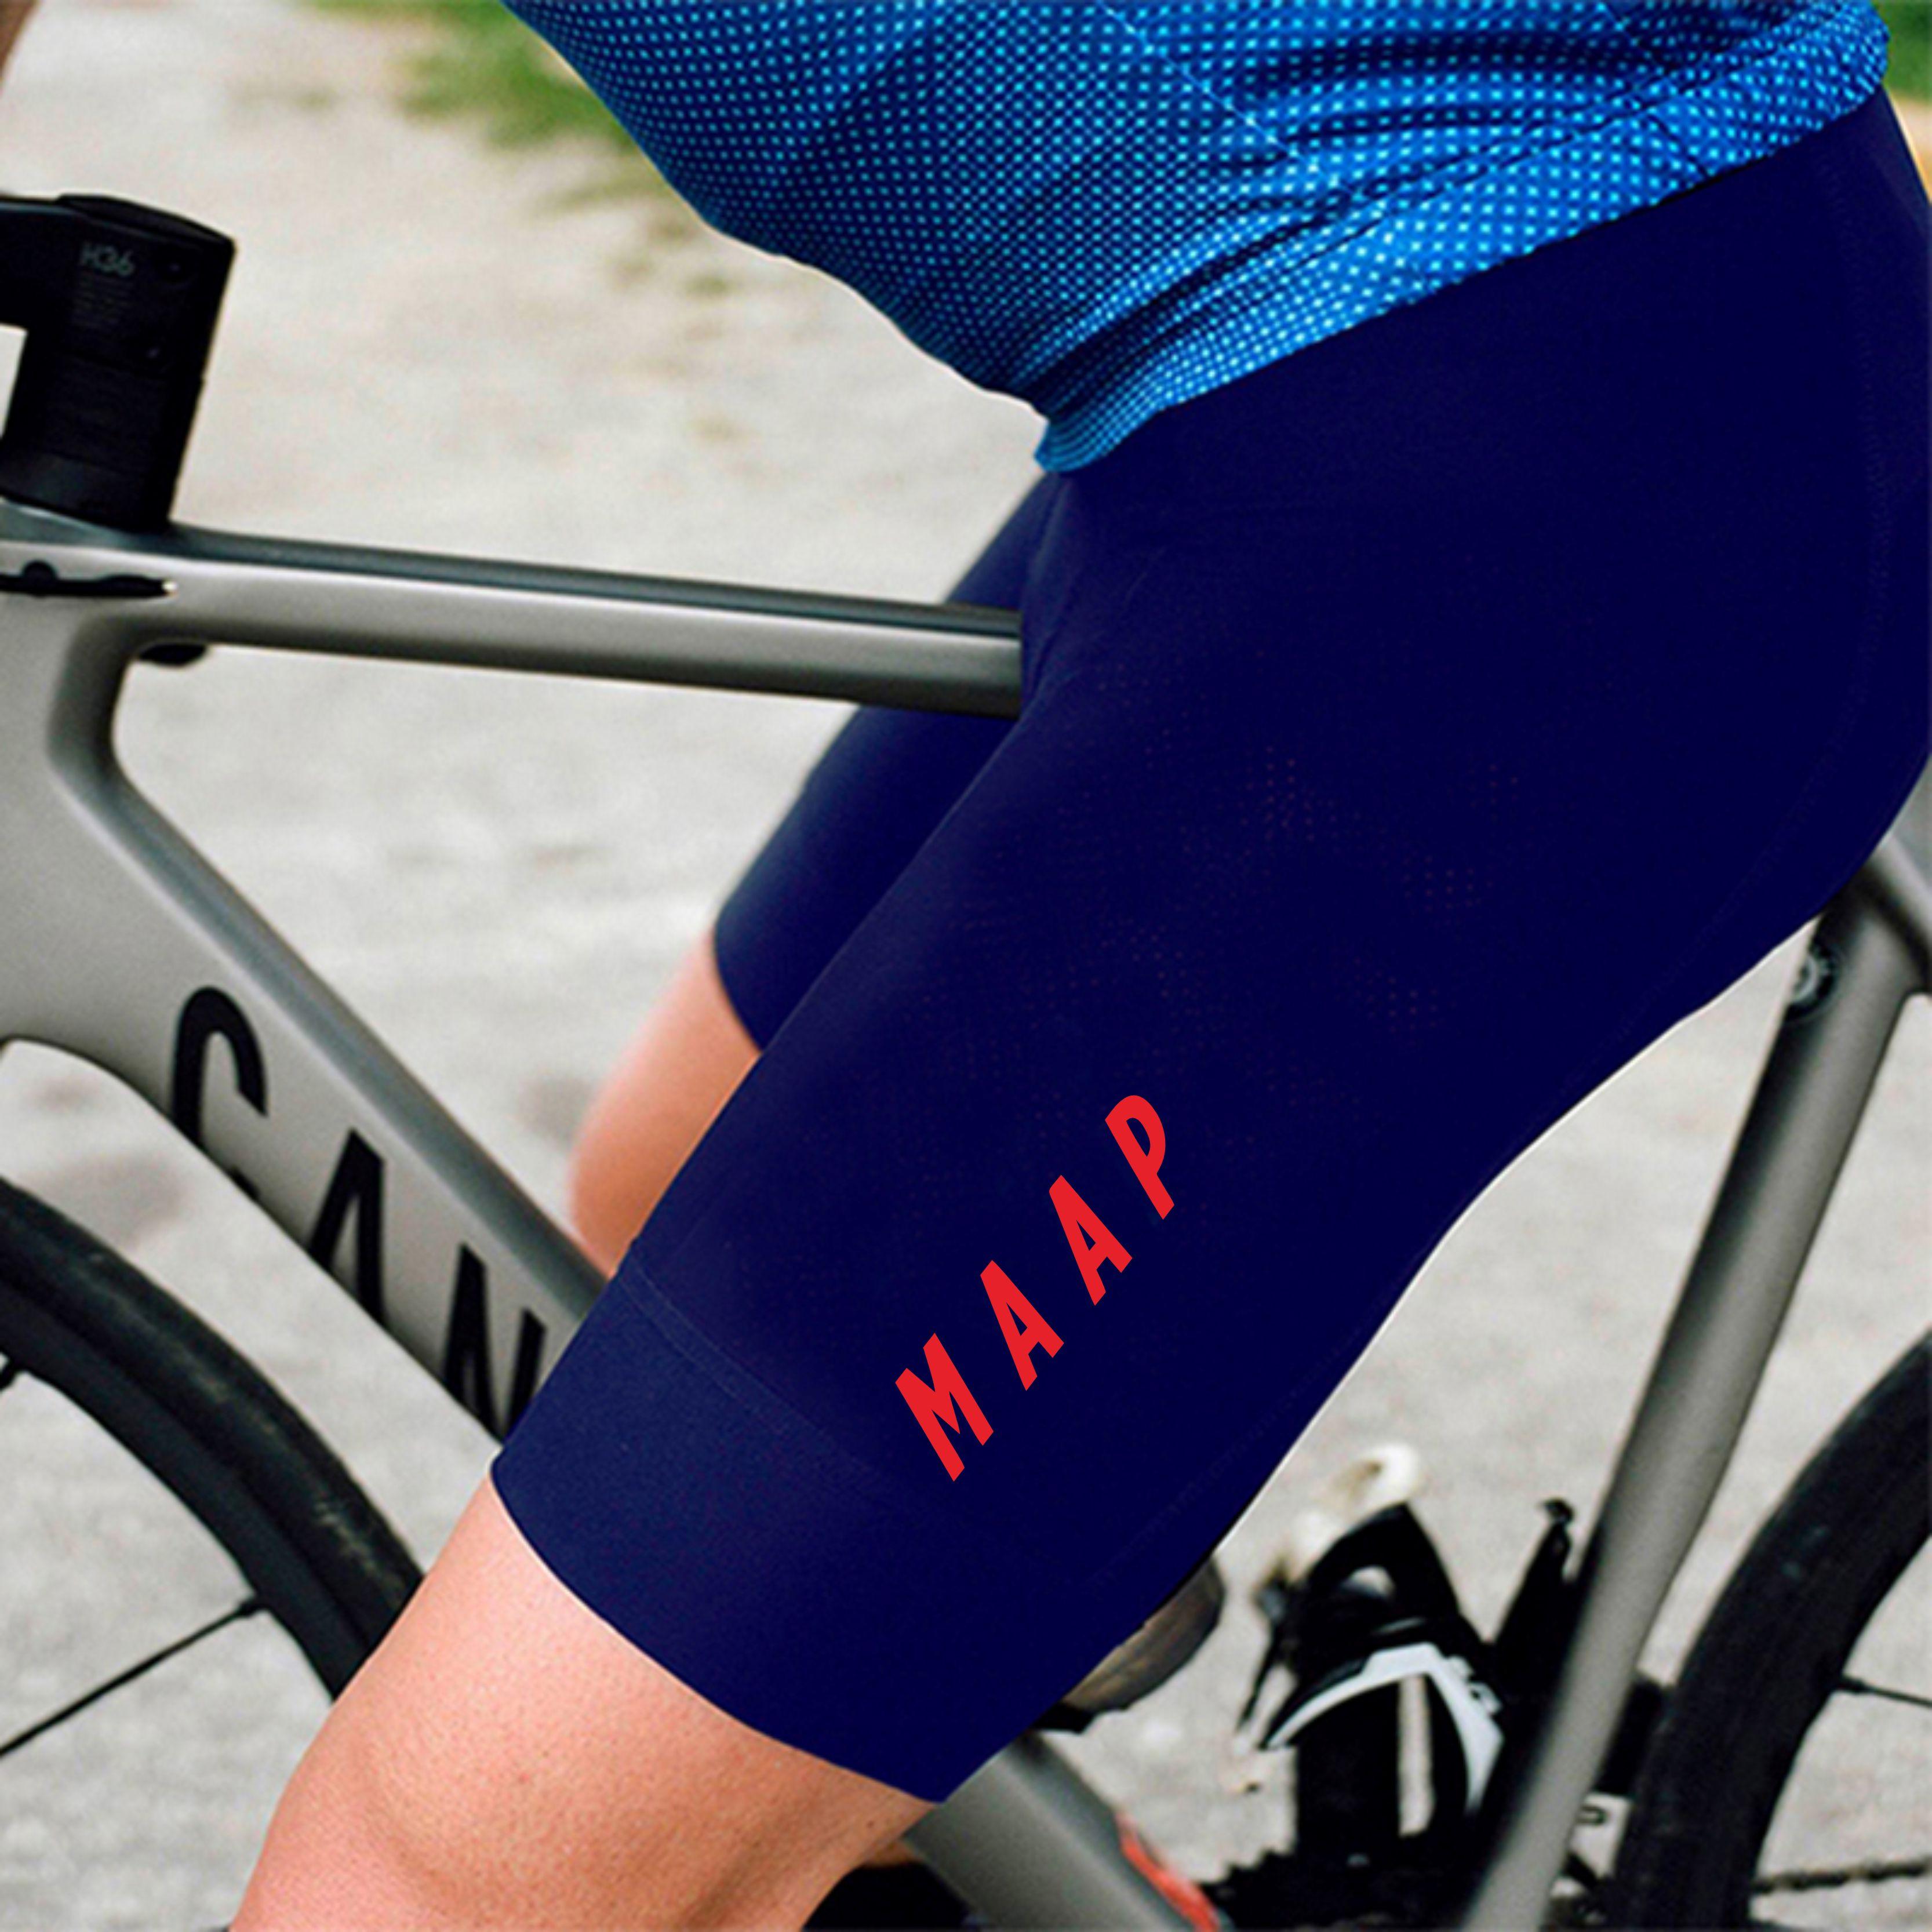 Triathlon cullote cycling culotes cortos ciclismo hombre MAAP summer pro team Navy blue bib shorts men mtb bike culote ciclismo in Cycling Bib Shorts from Sports Entertainment